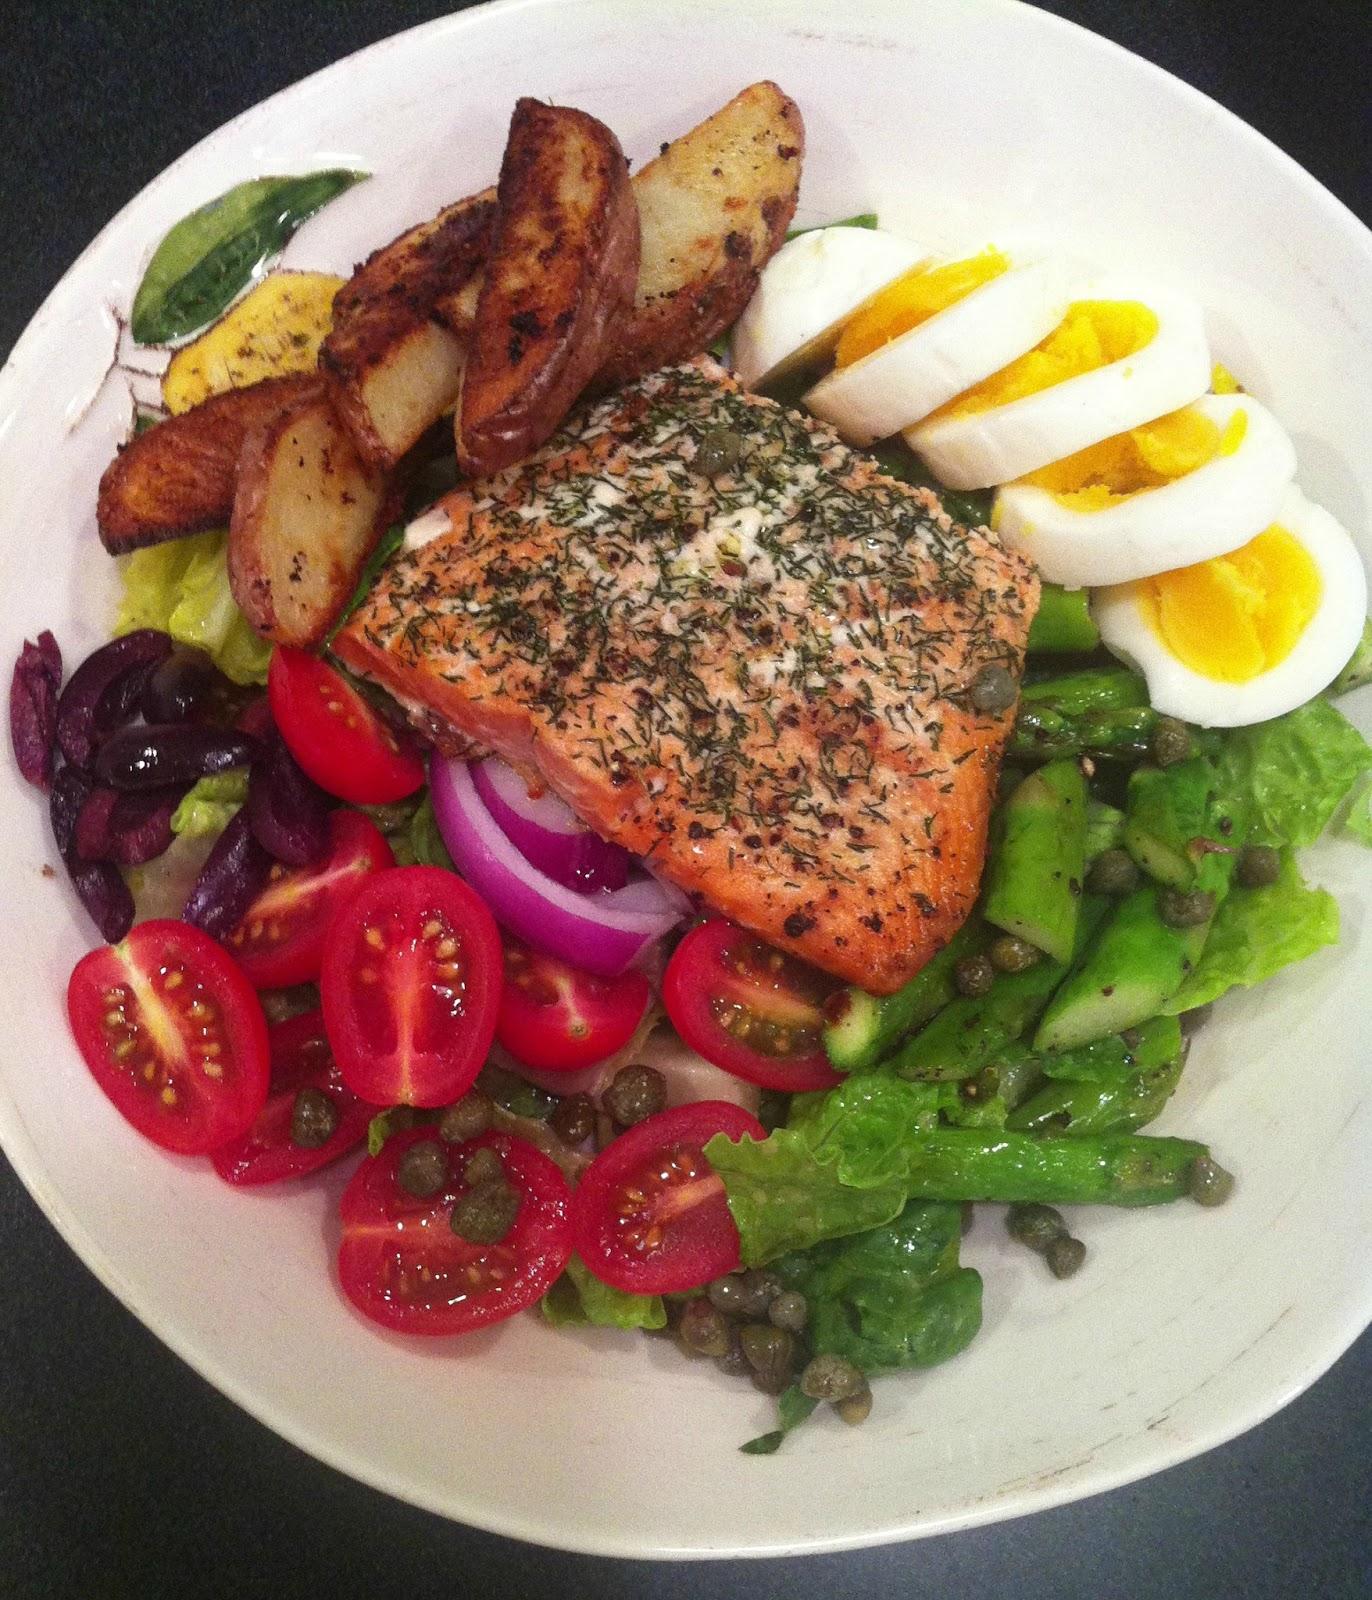 Peace love good food roasted salmon nicoise salad roasted salmon nicoise salad forumfinder Image collections